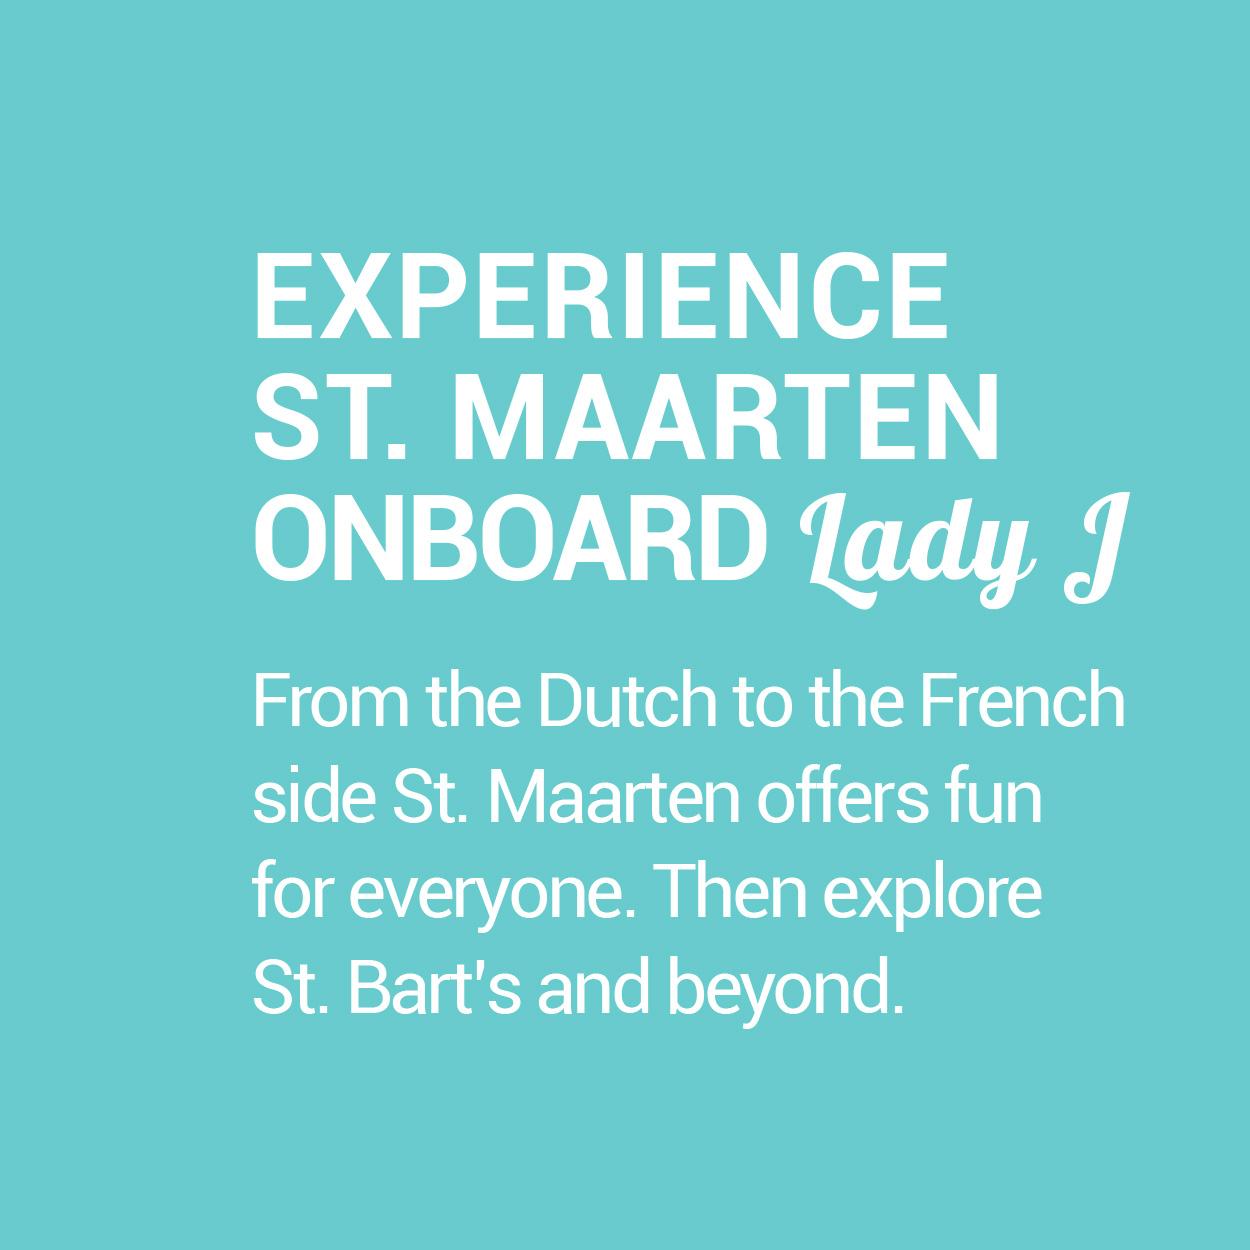 LJ_ART_Banner_SQ_St-Maarten.jpg